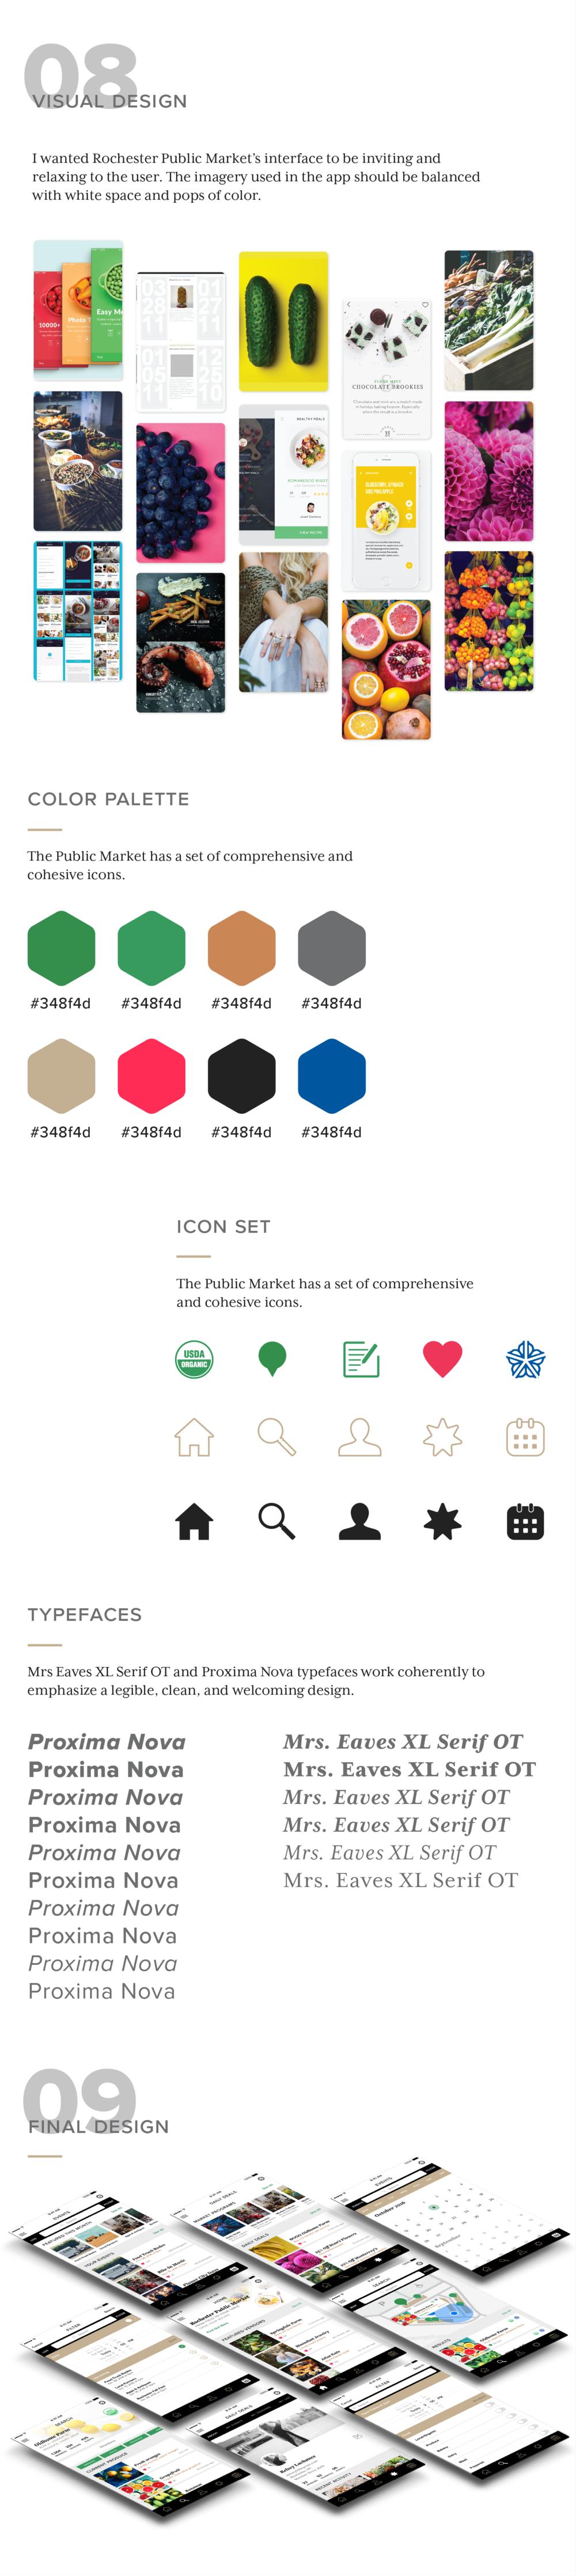 150 Portfolio 6-Public Market-01.png